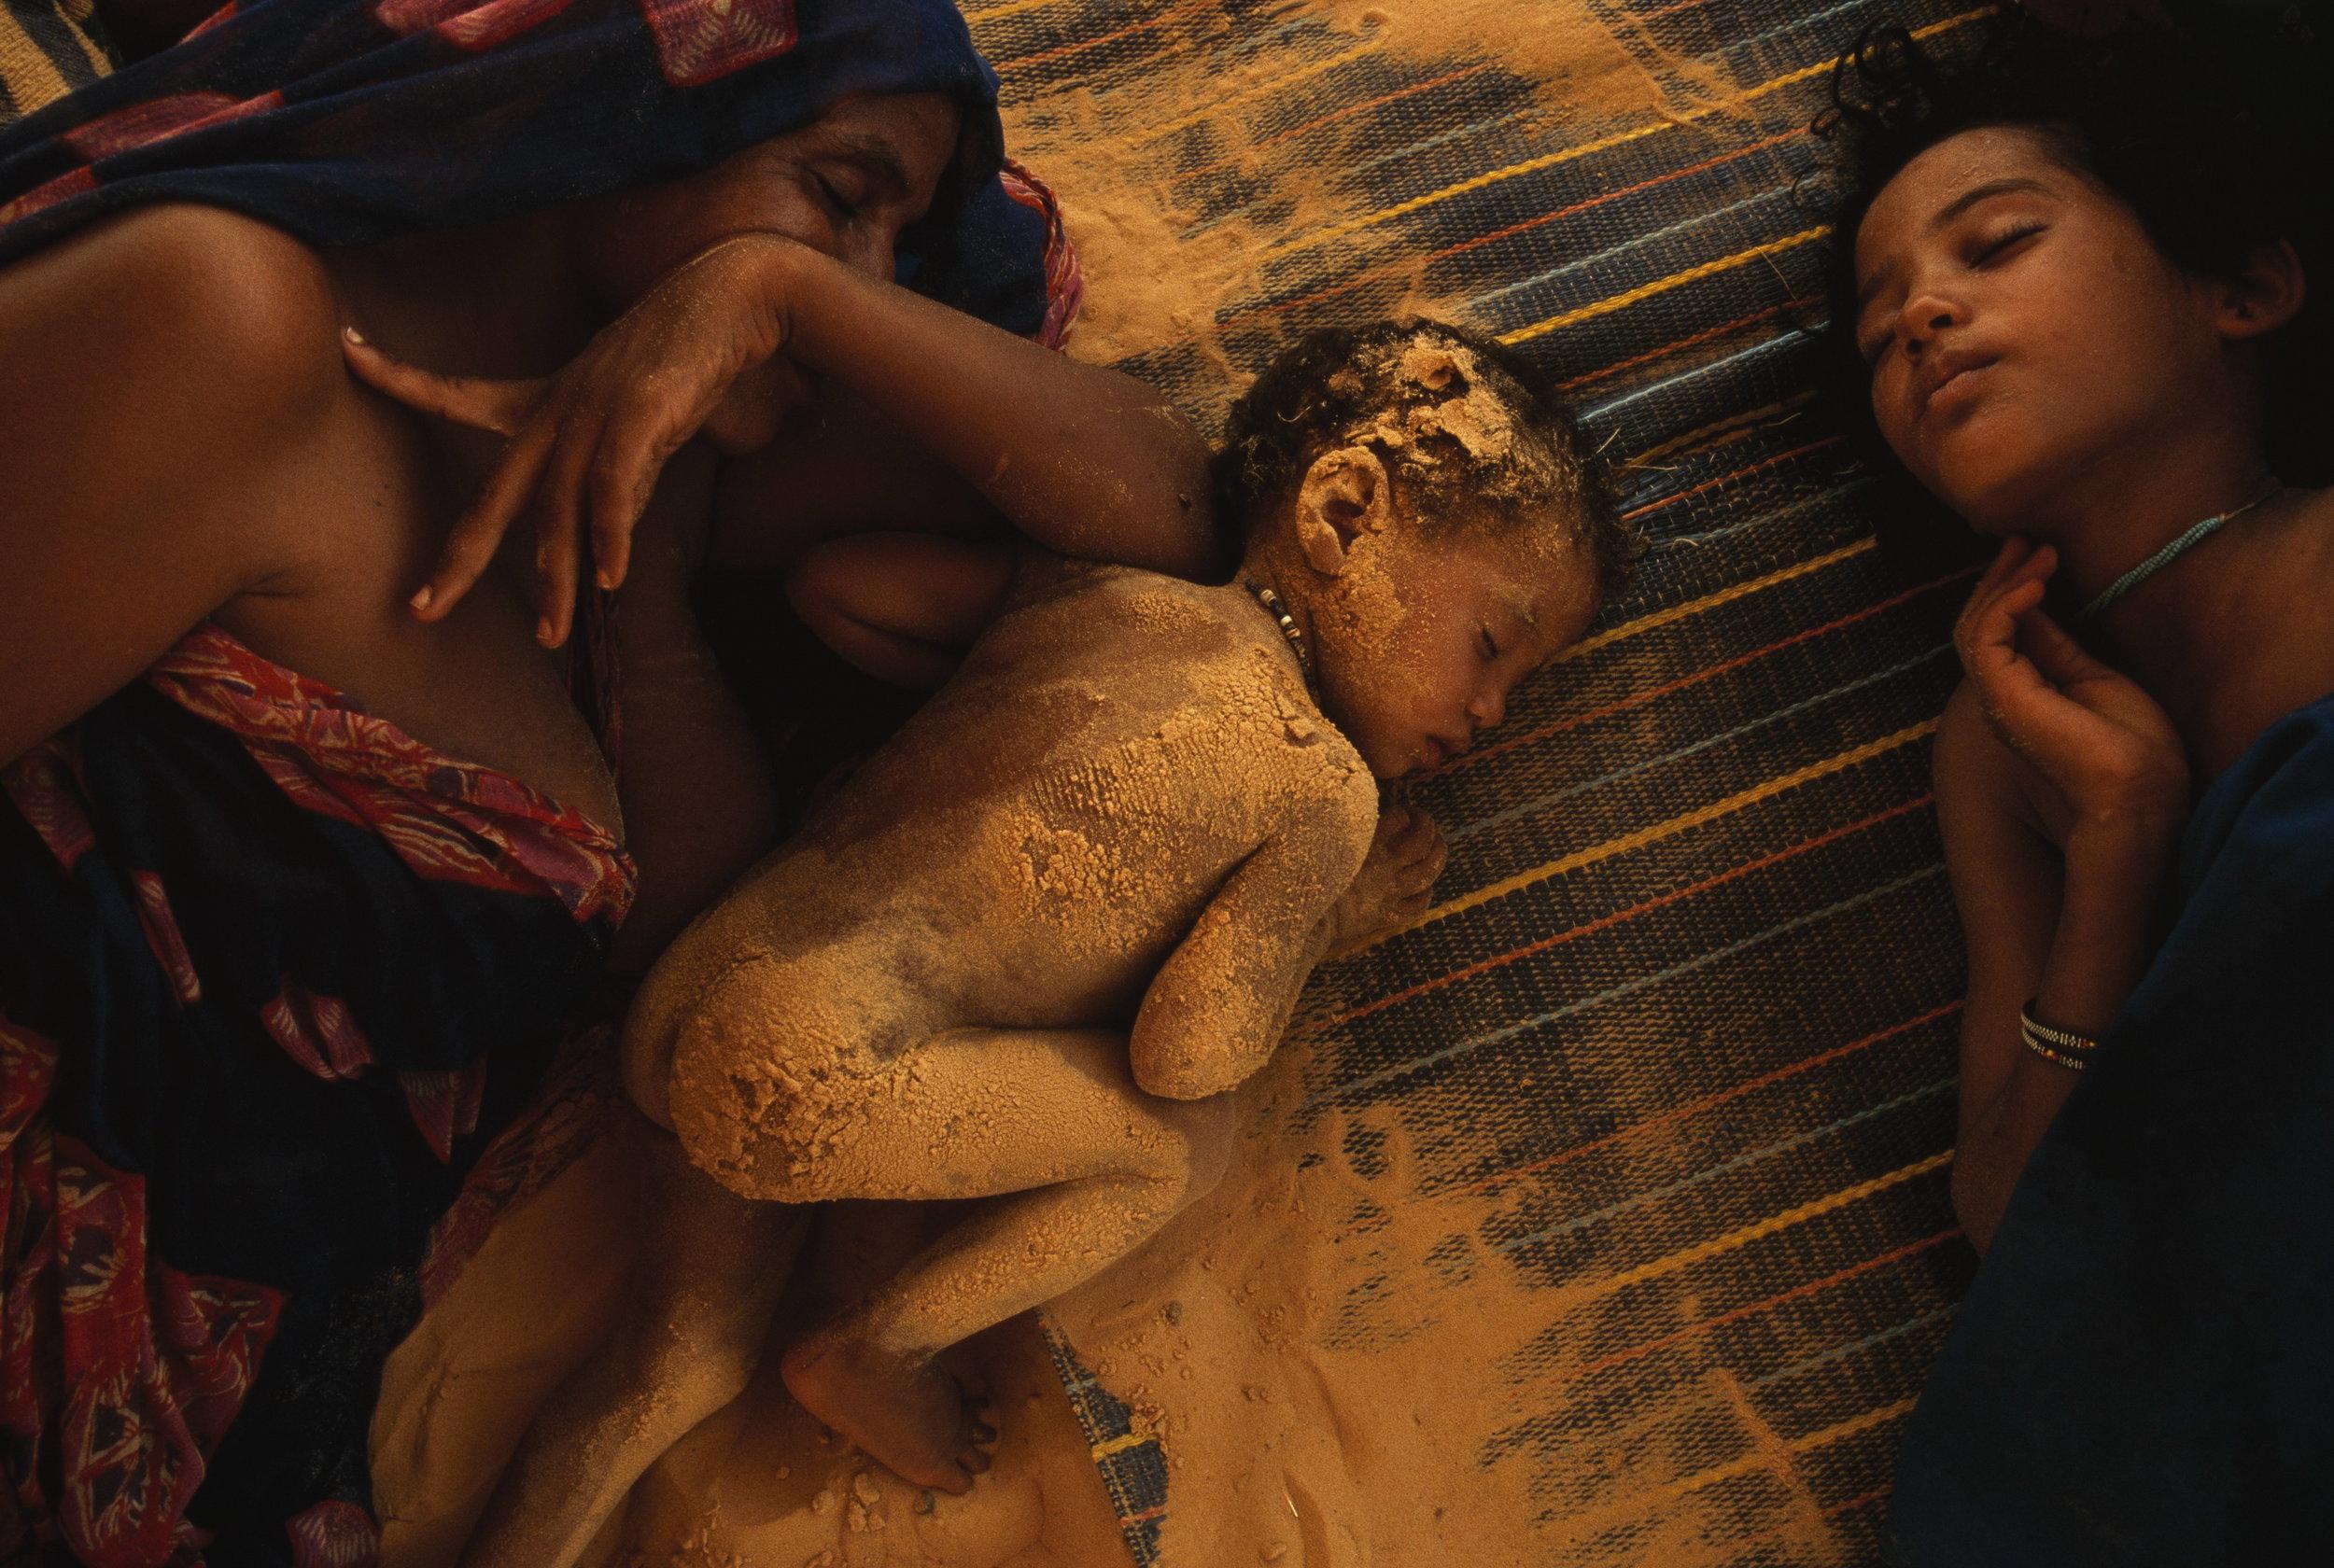 Sub-Saharan Mali 1997, Photo by Joanna B. Pinne